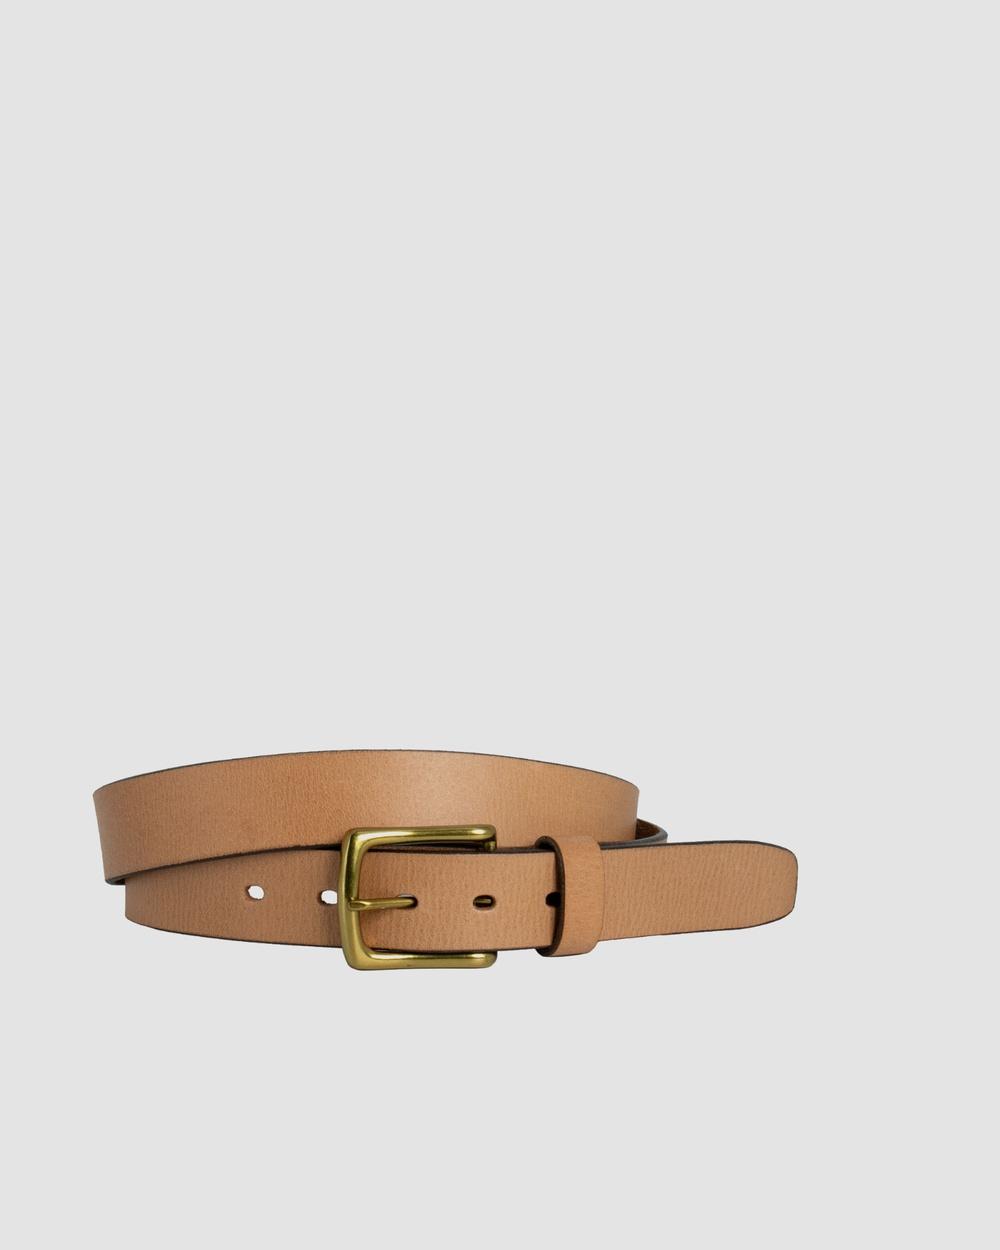 Loop Leather Co Bourke Belts Natural